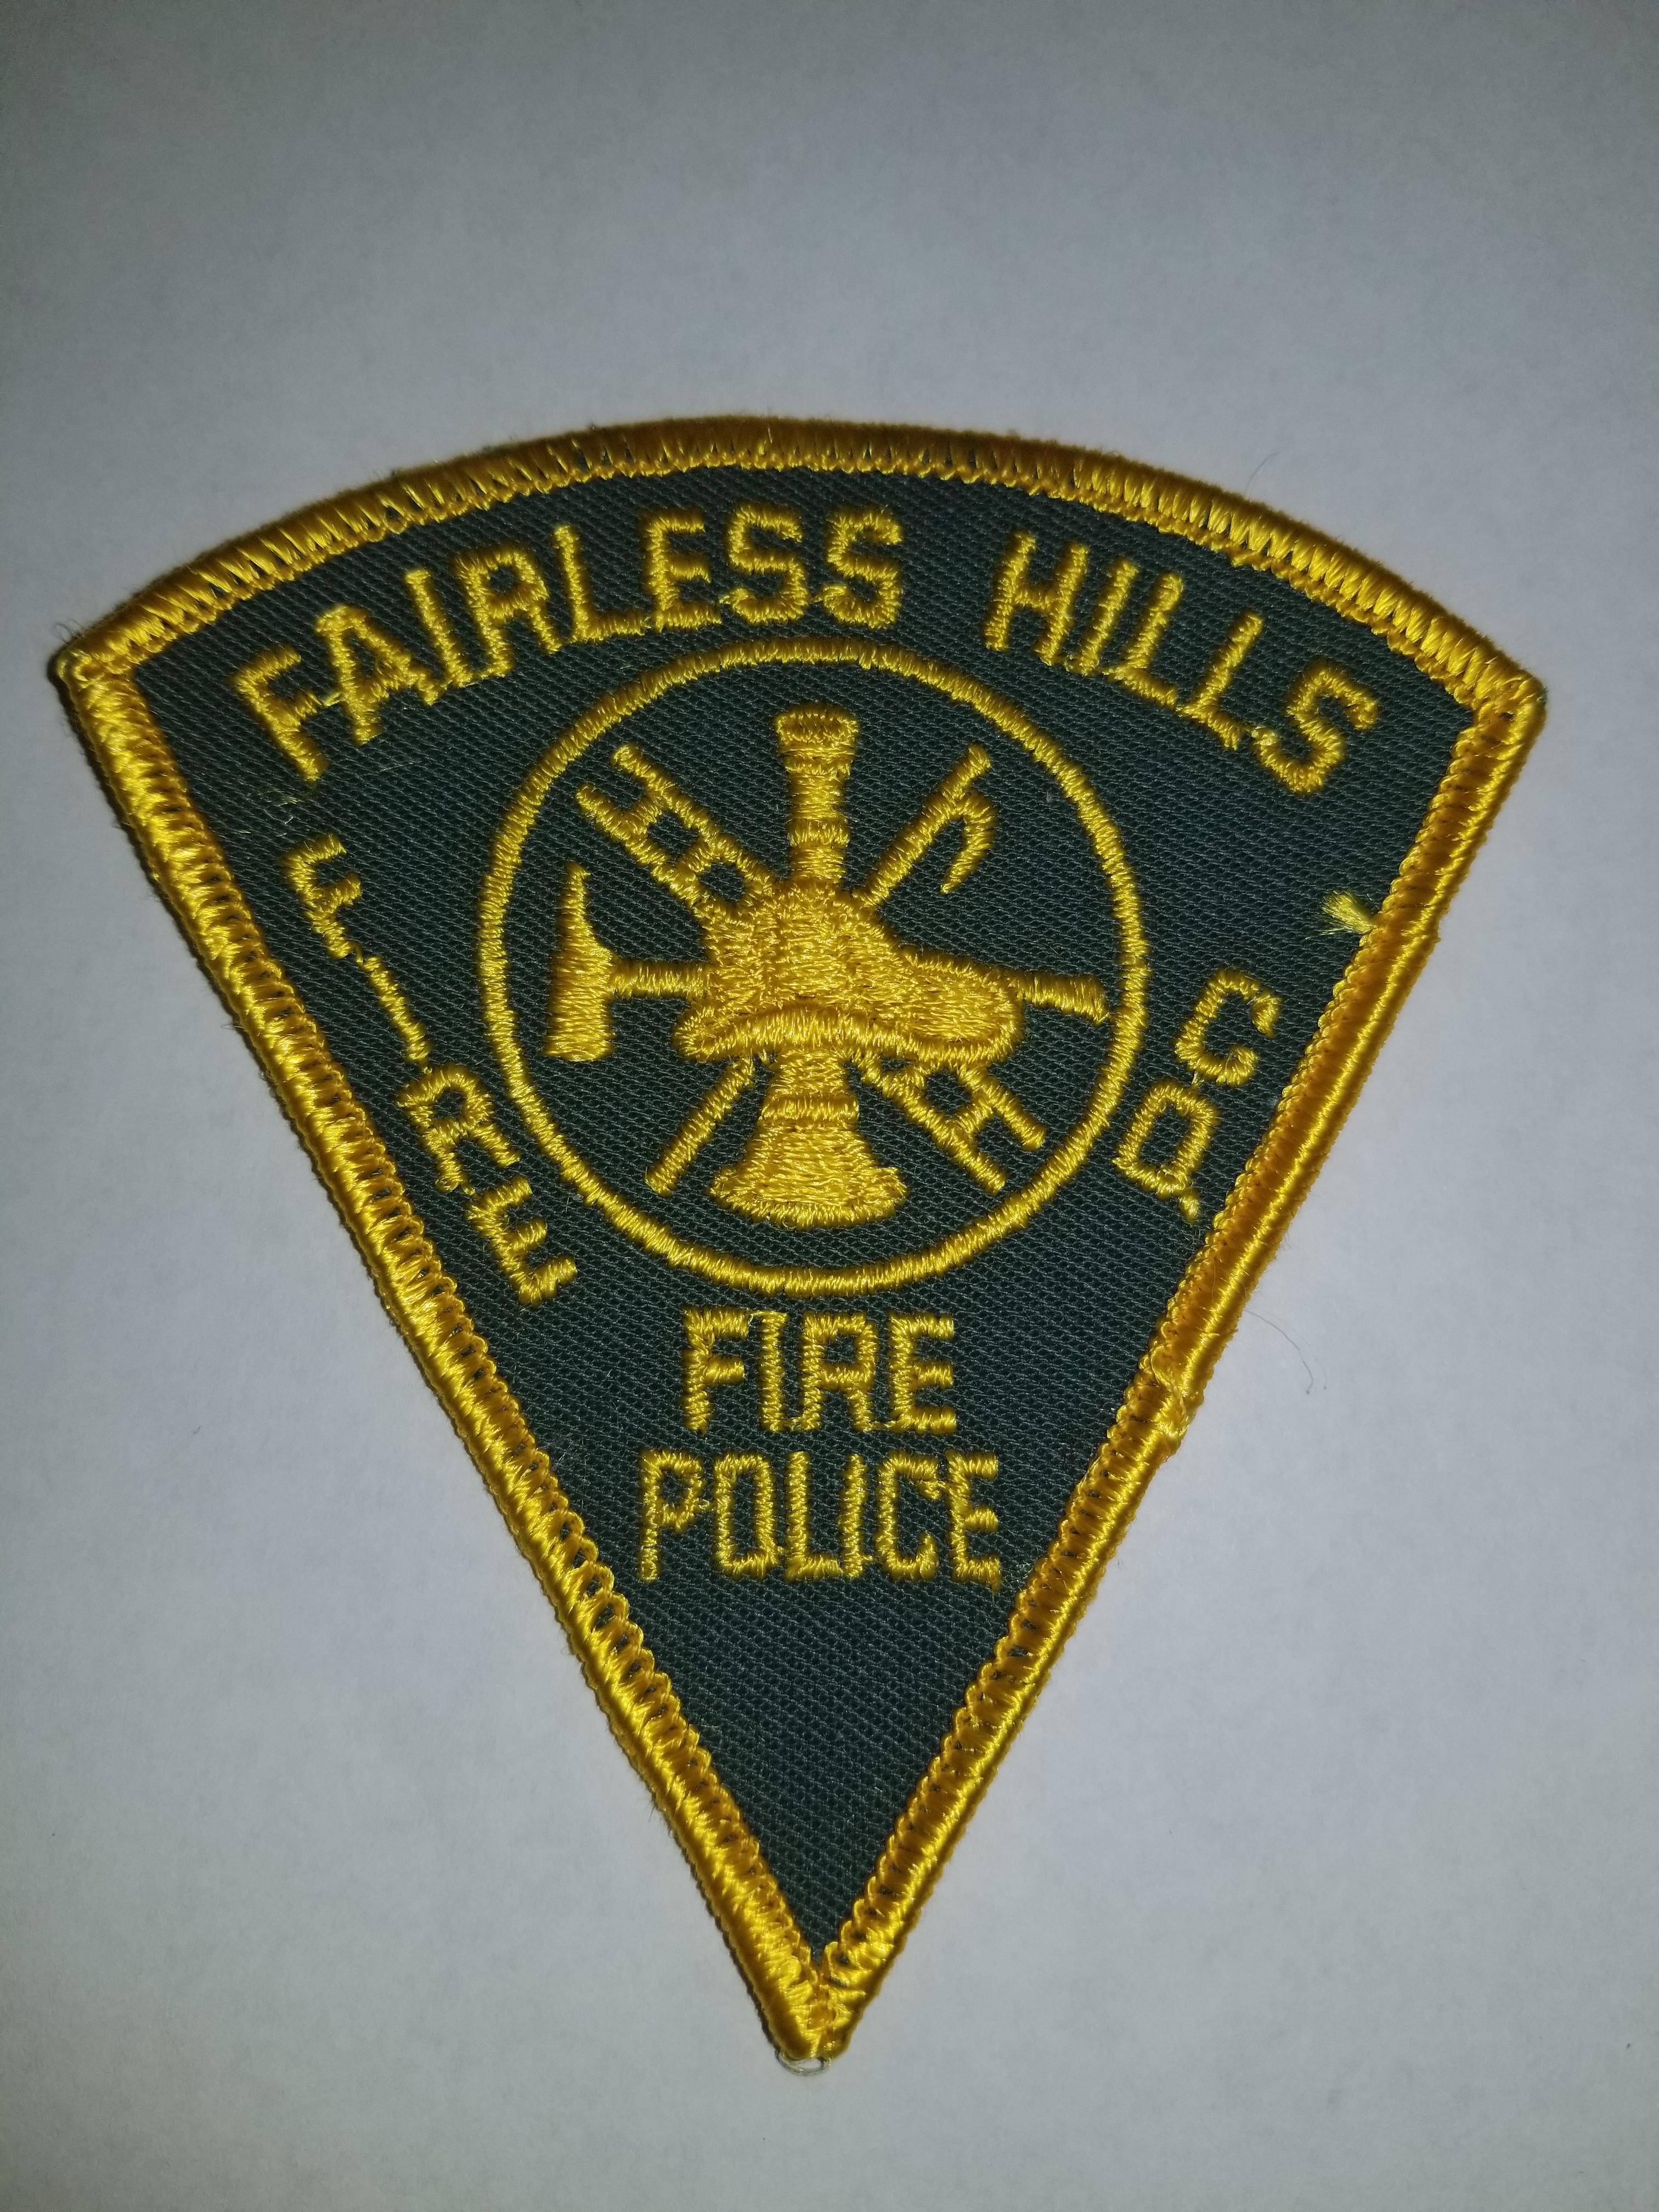 Fairless Hills Fire Co. Fire Police